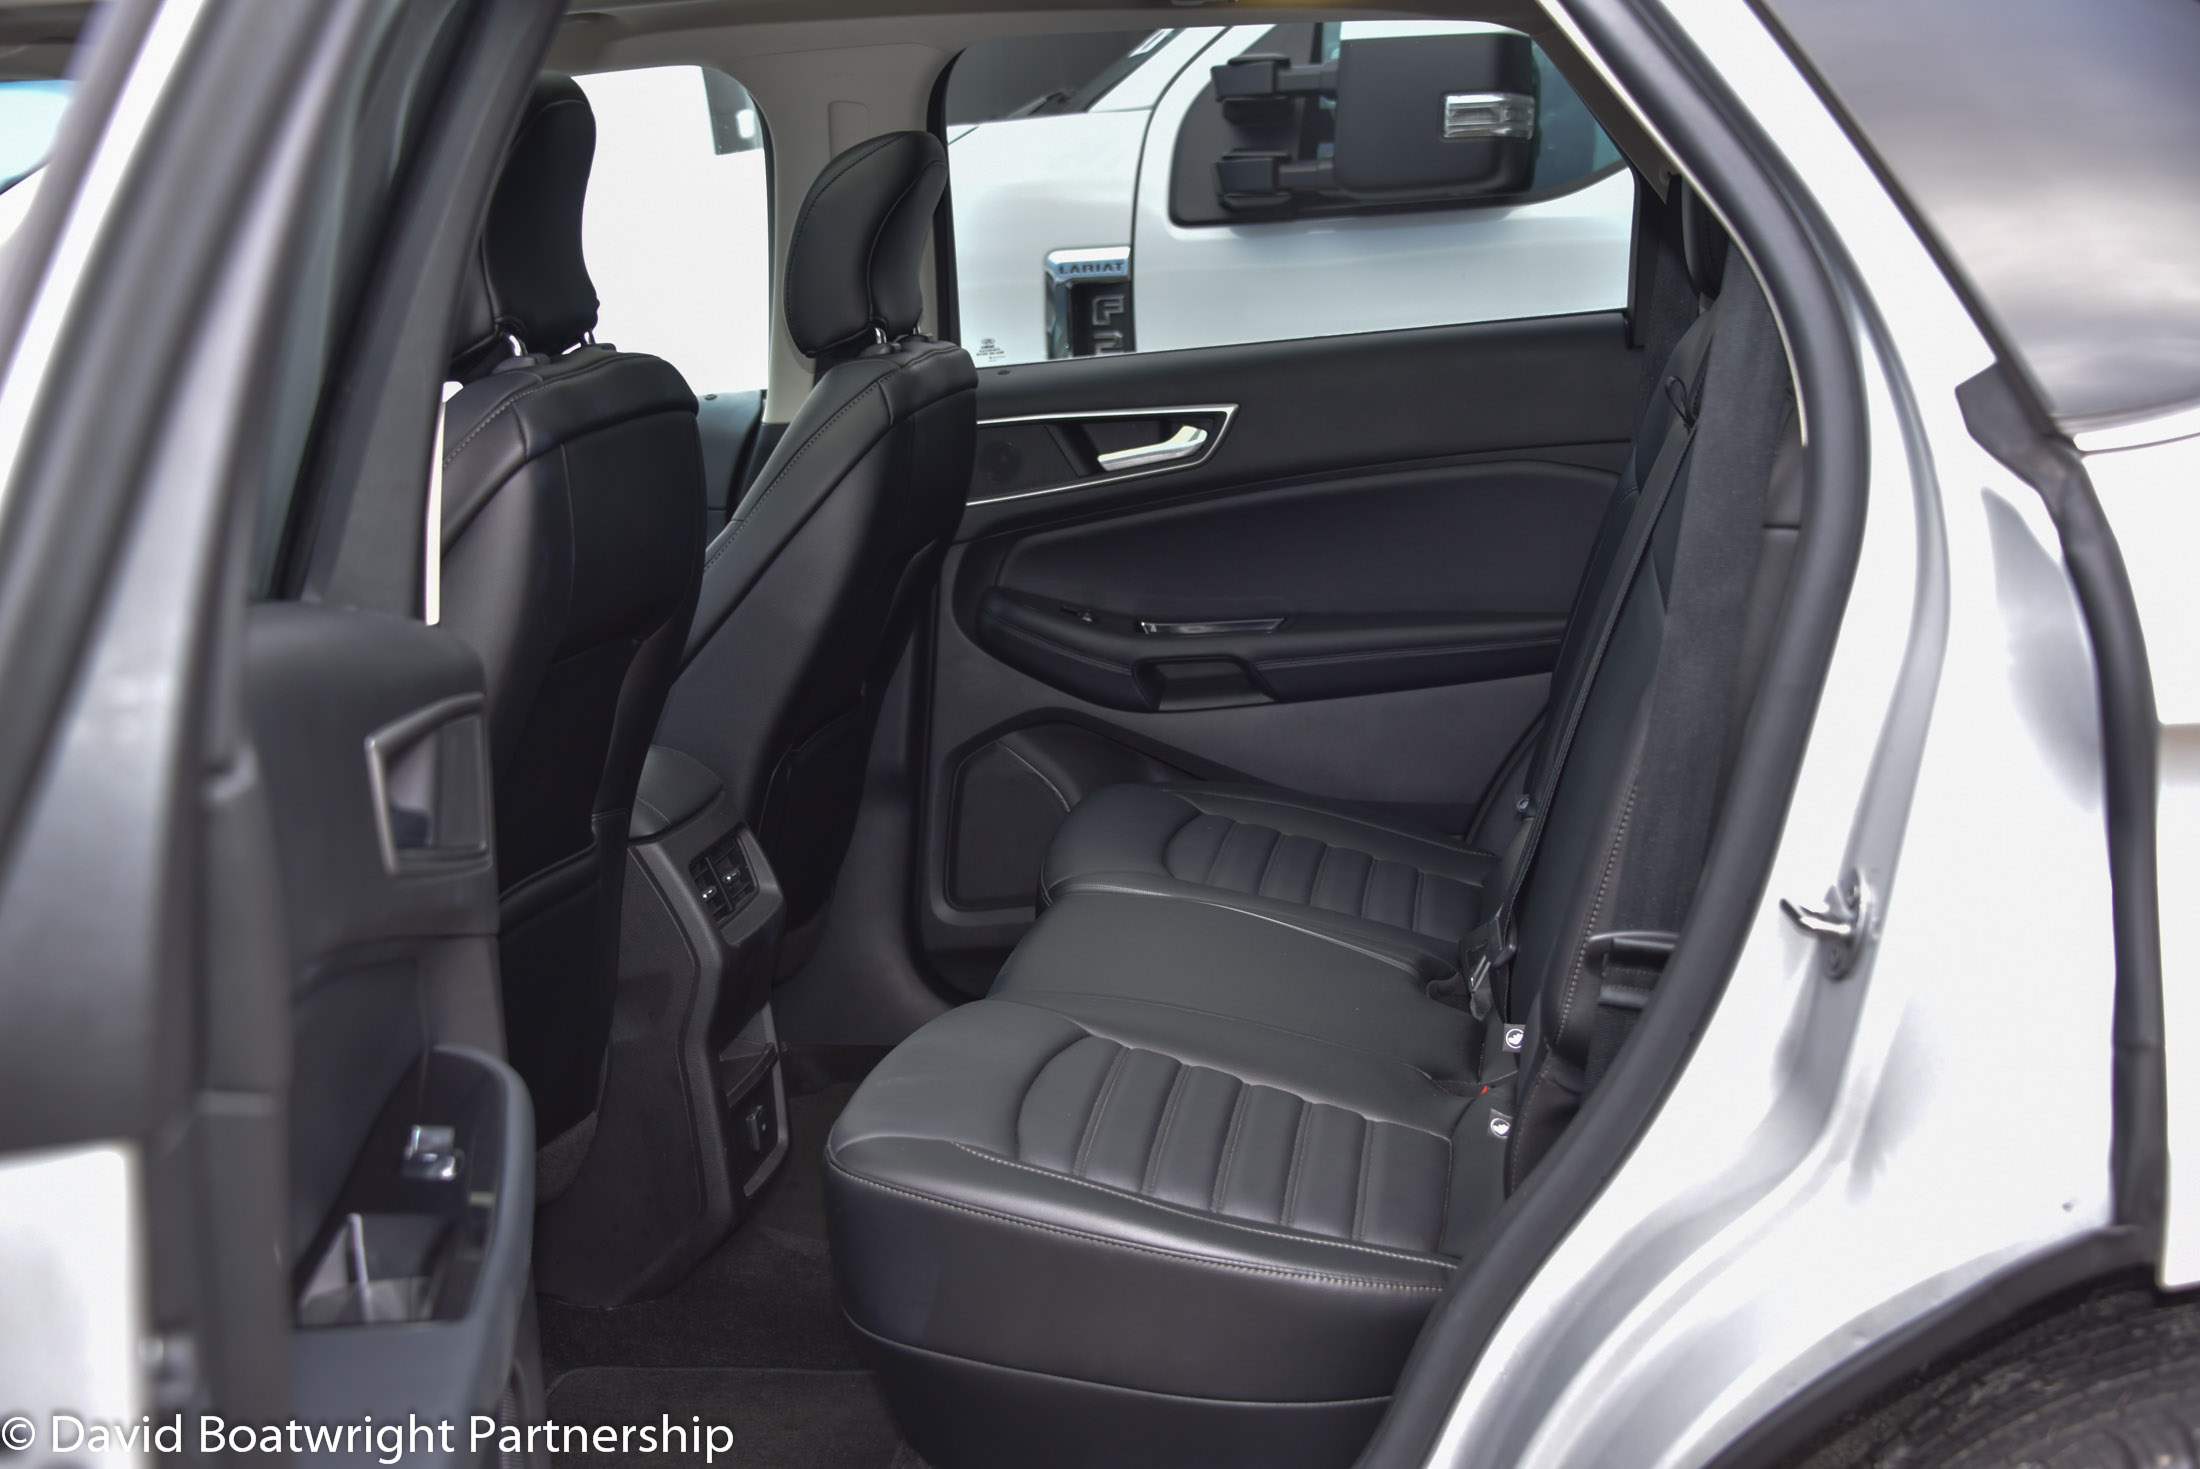 Ford Edge V6 Petrol Auto LHD